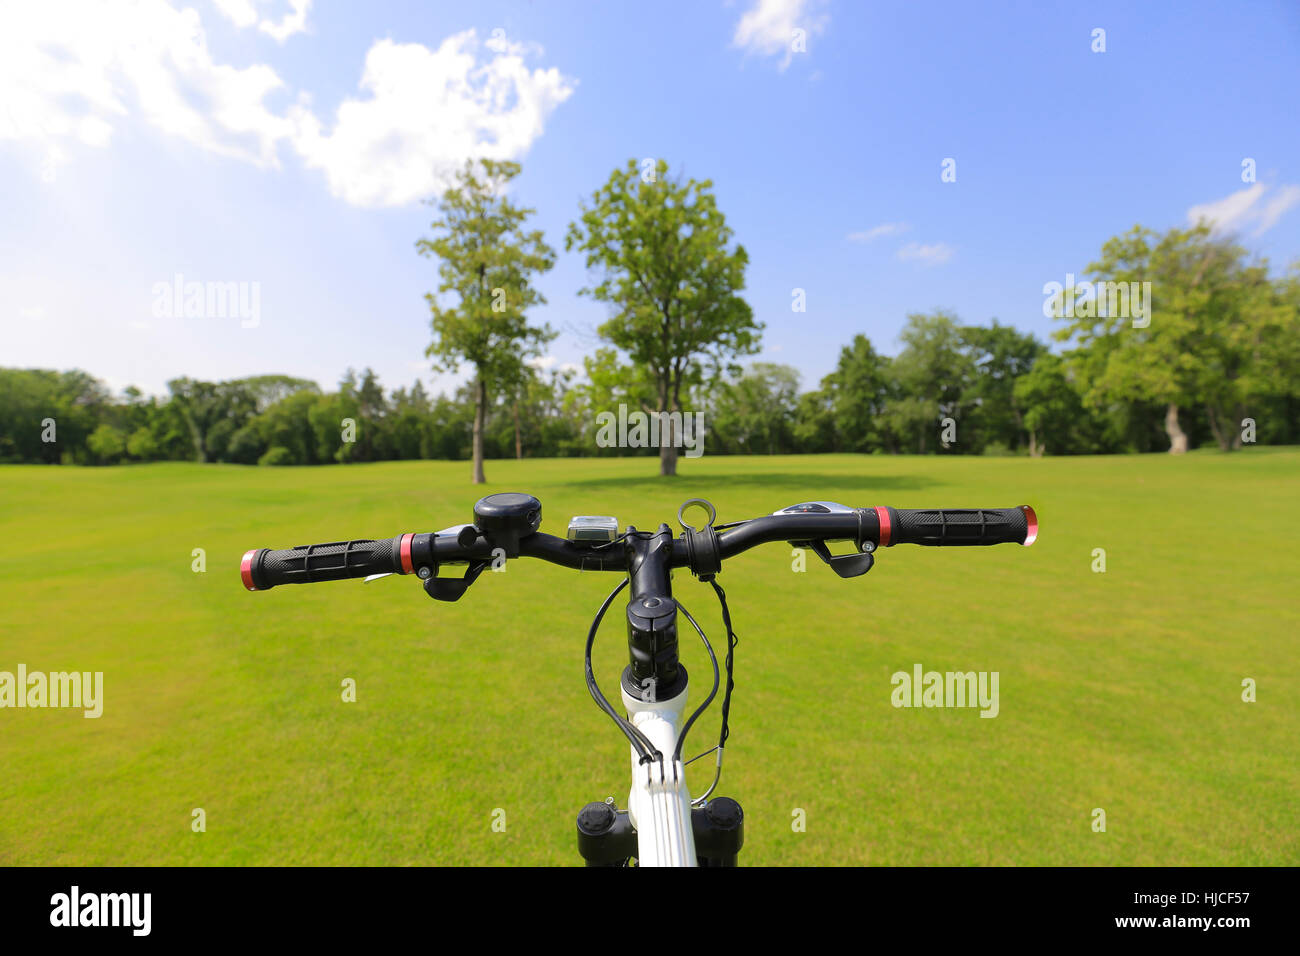 Bicycle - Stock Image